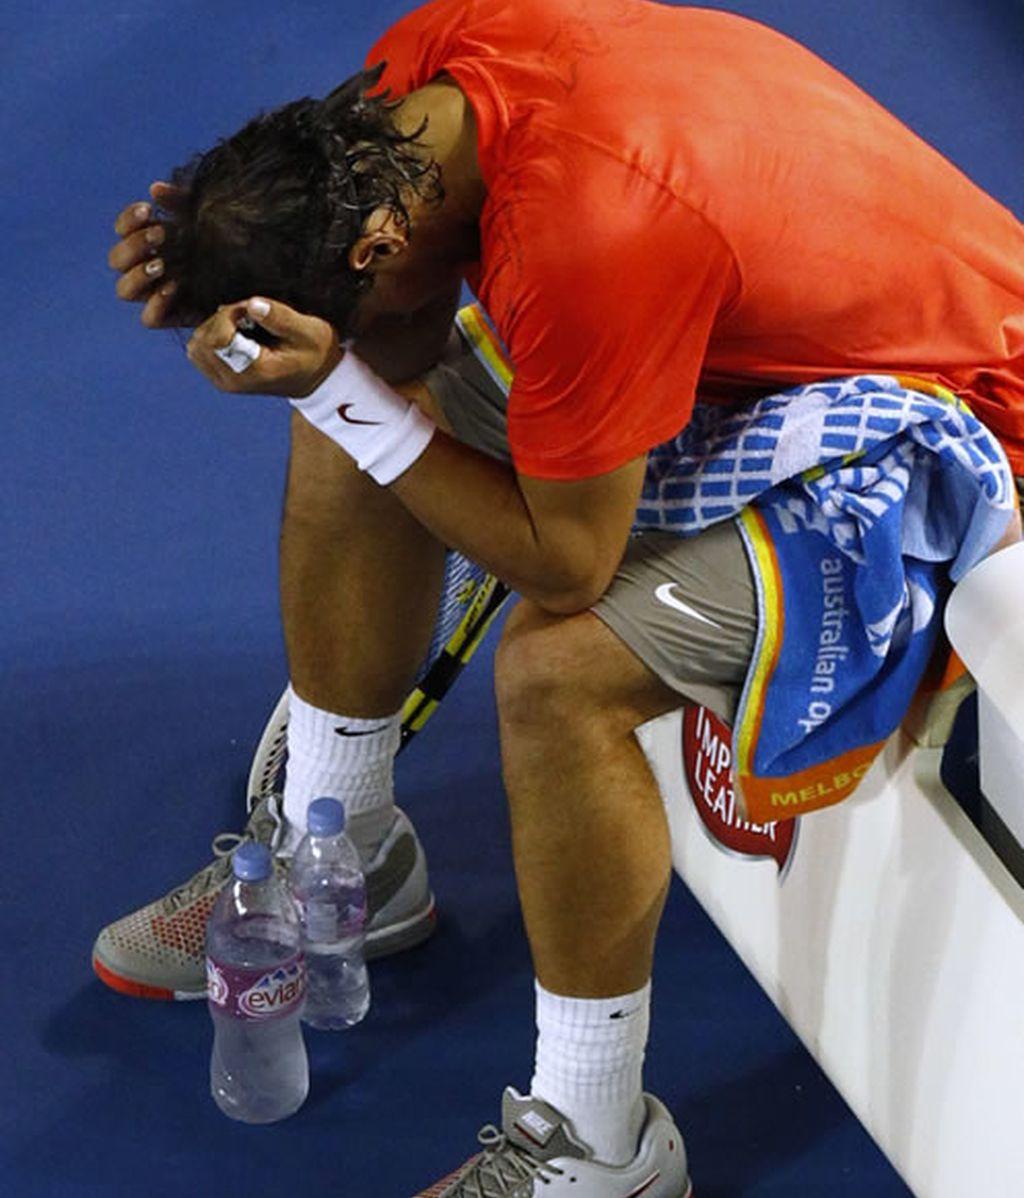 Nadal se lesionó durante su partido con Ferrer